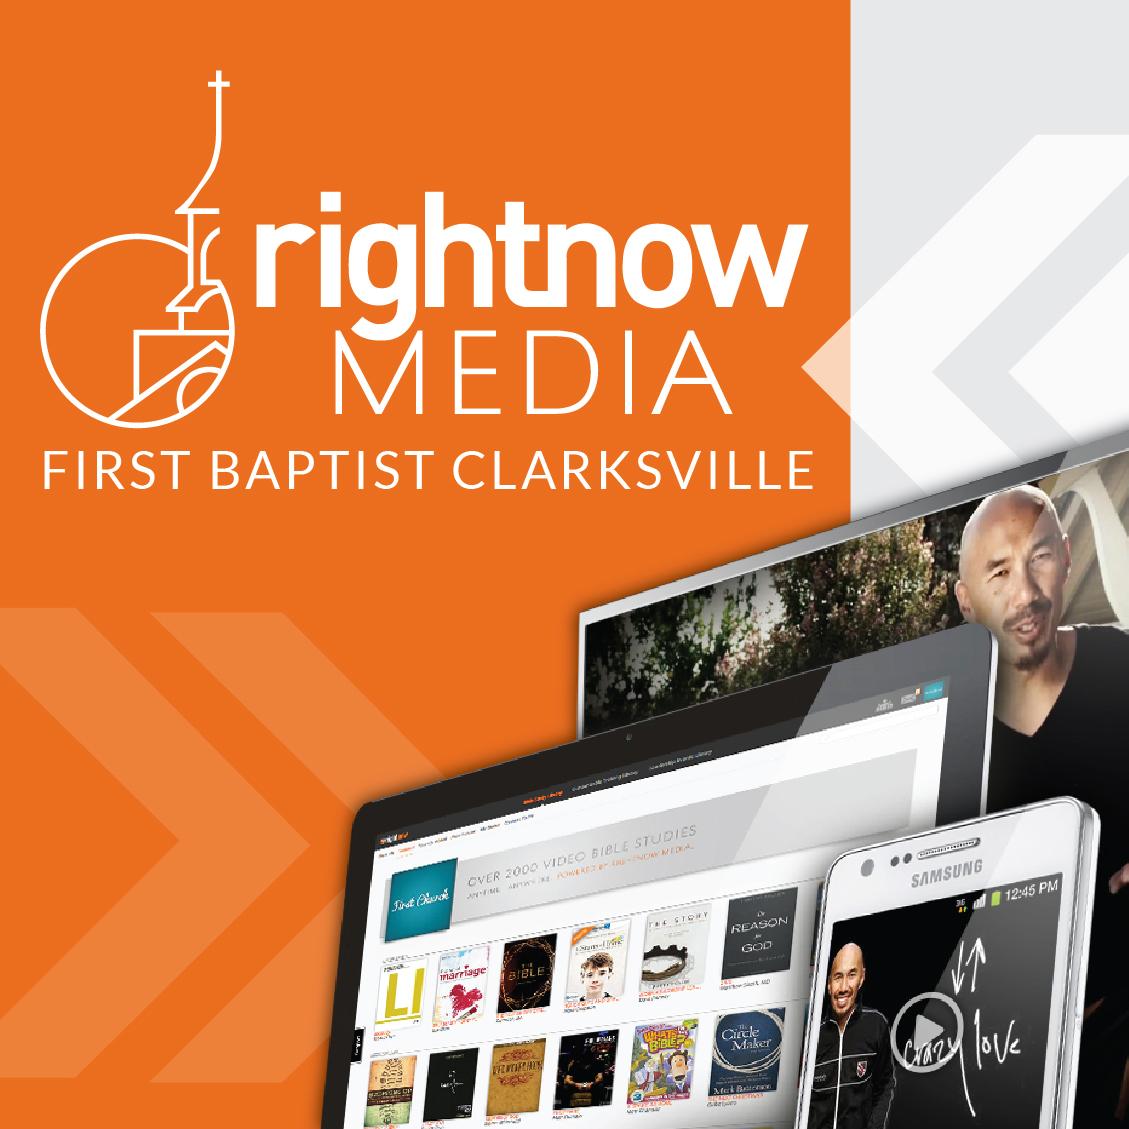 FBCT-RIGHTNOW MEDIA GRAPHIC-SquareWEBSITE.jpg